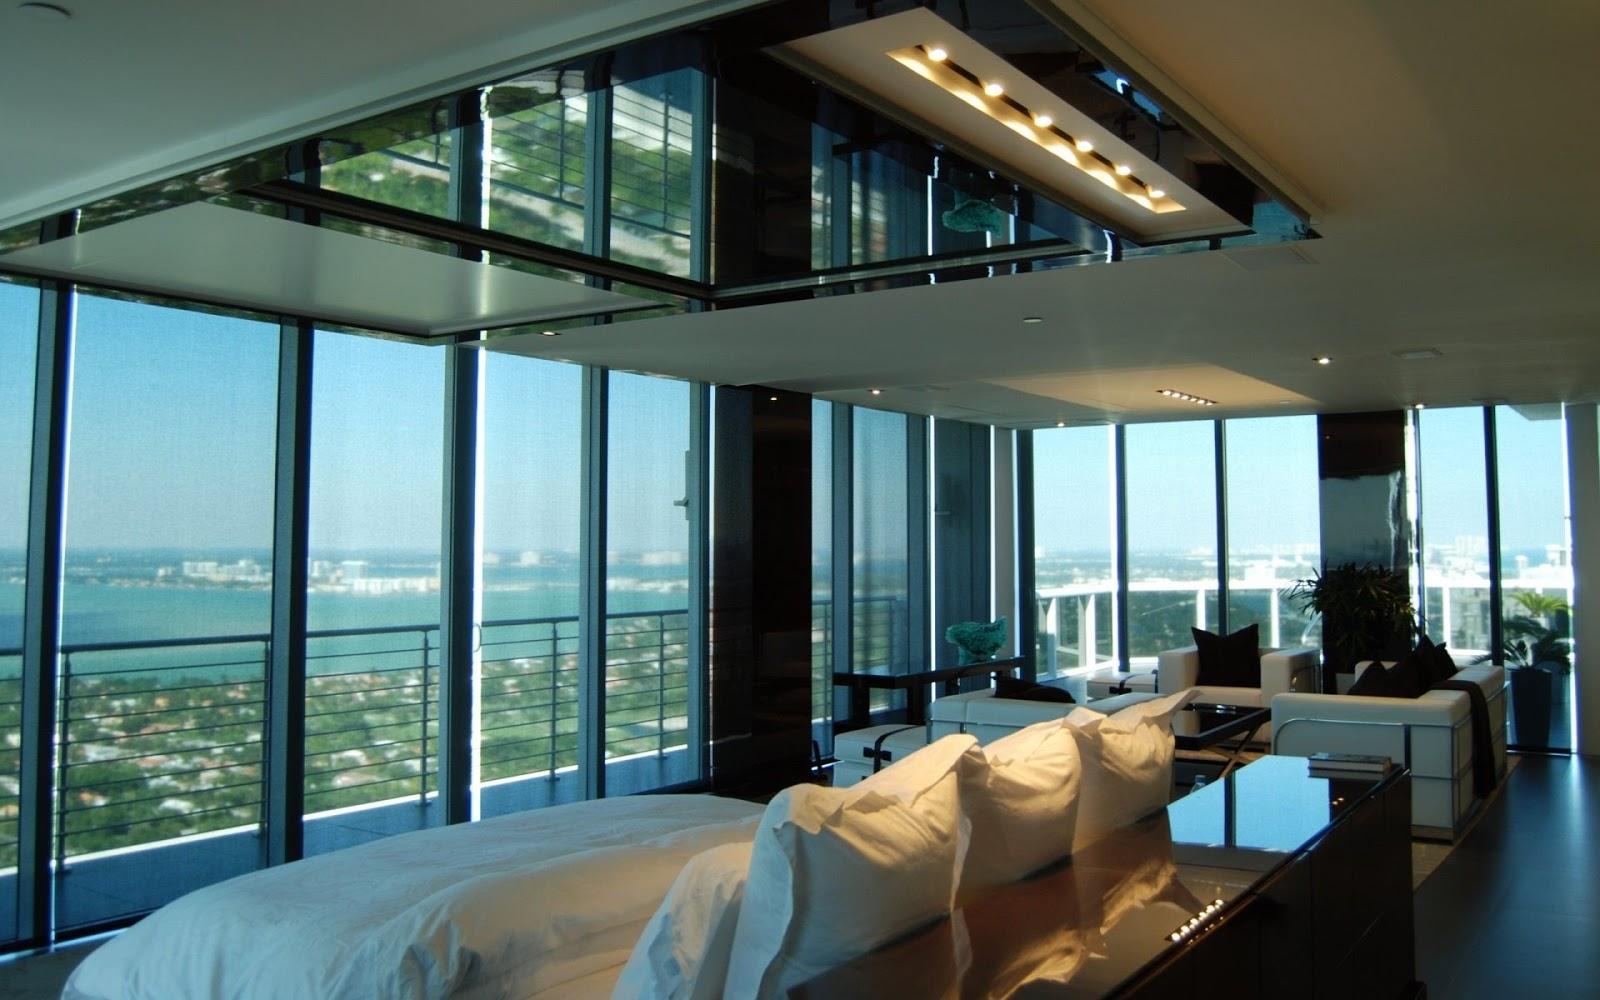 penthouse mystery wallpaper